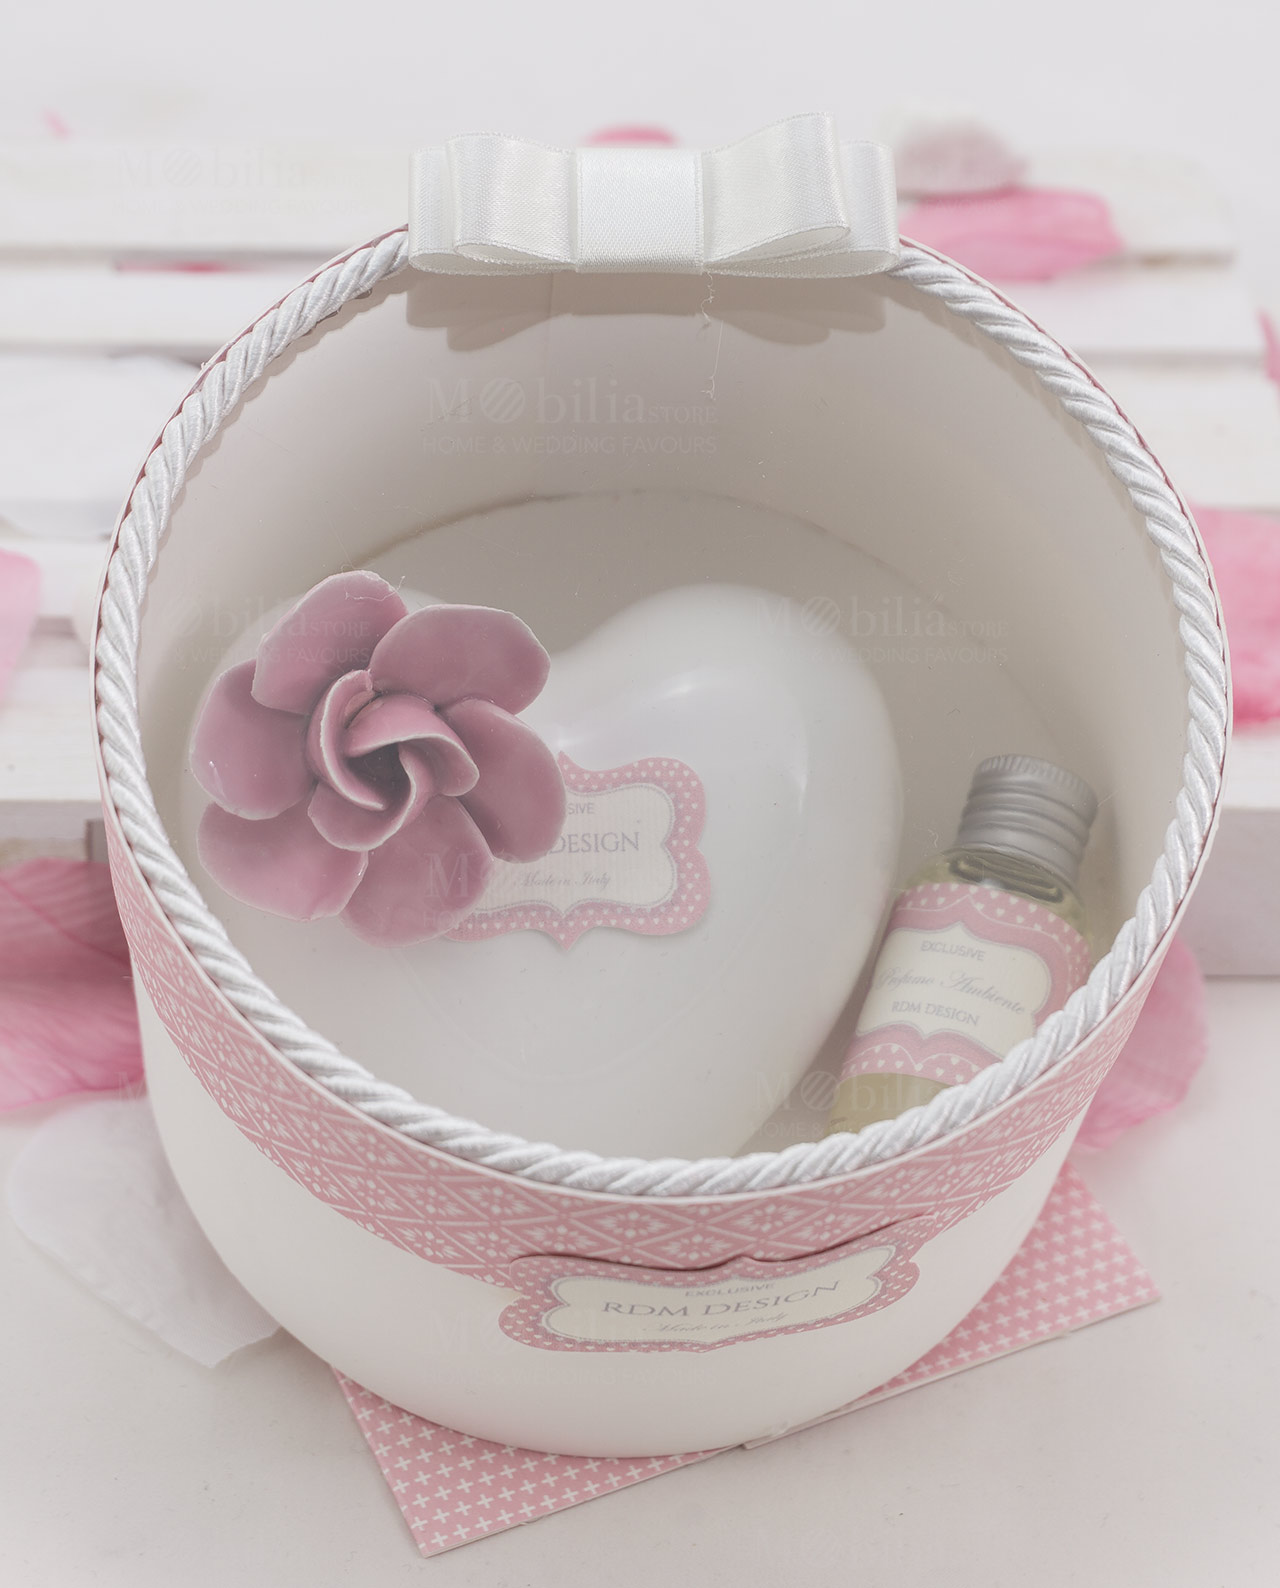 Bomboniera profumatore cuore linea Blush Rdm Design